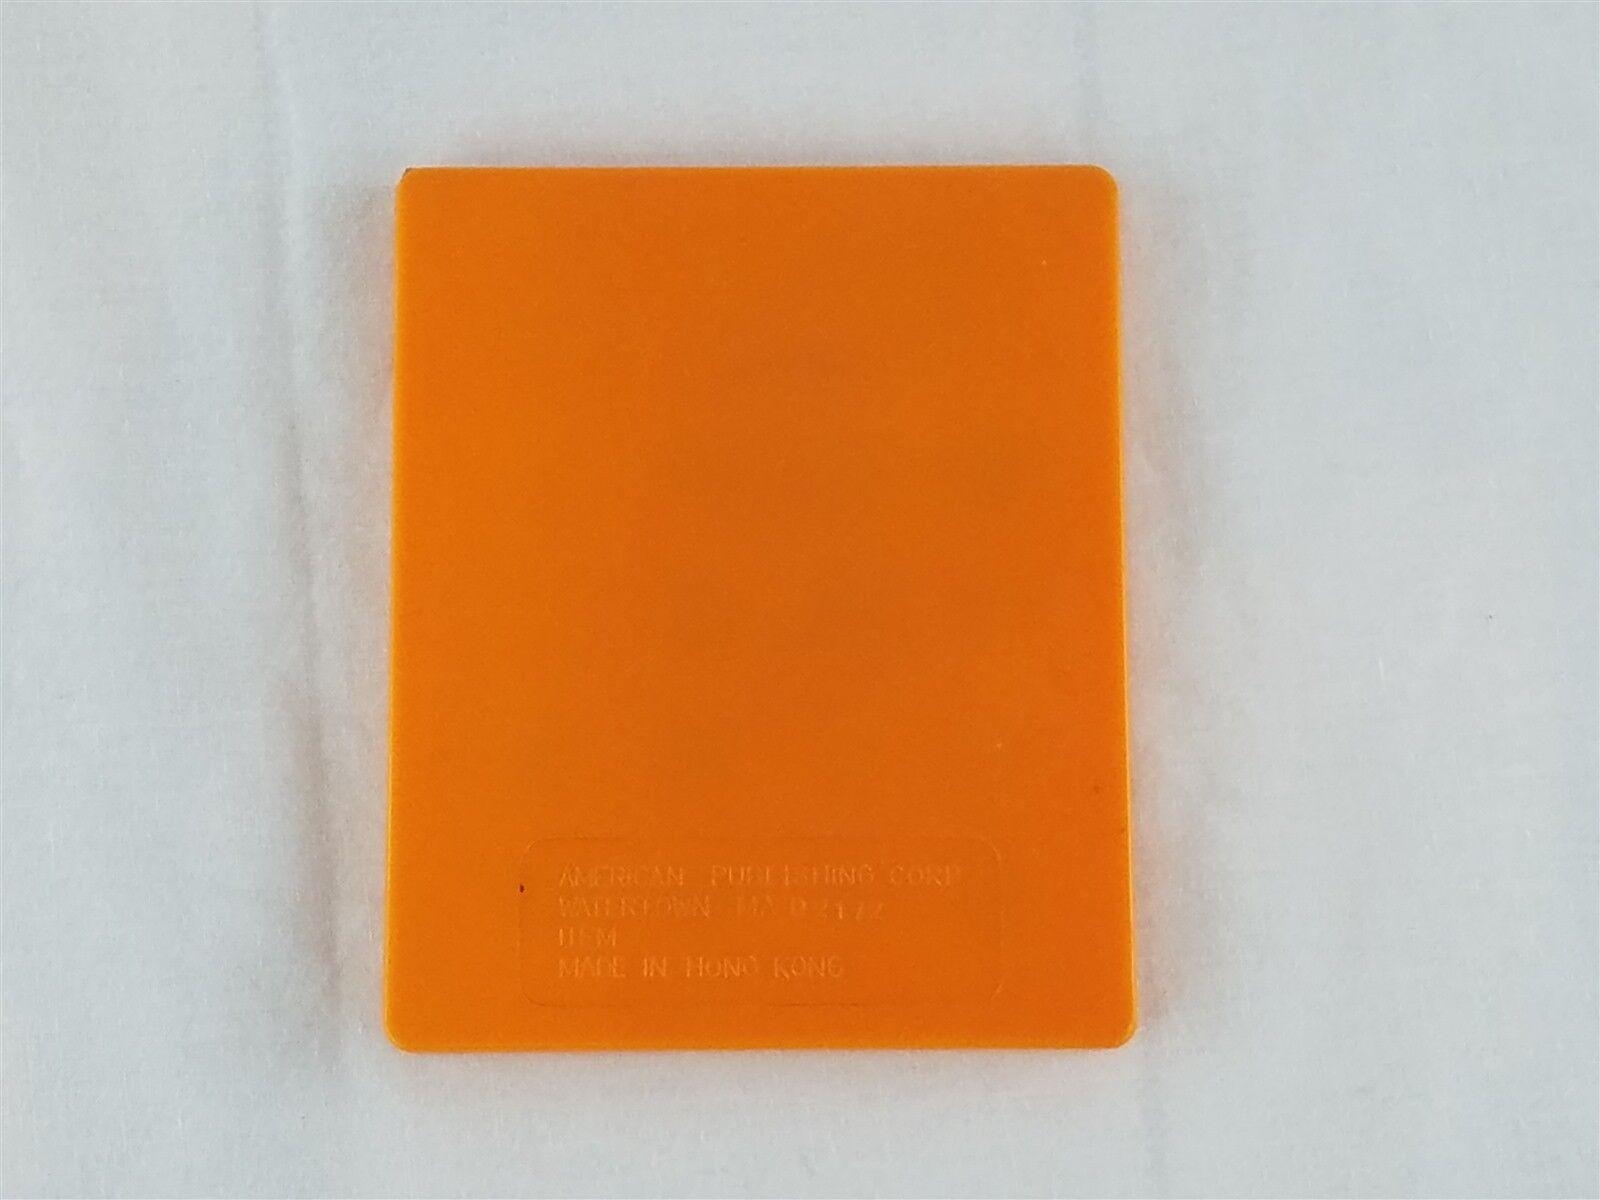 DUNGEONS AND DRAGONS KNIGHT KNIGHT KNIGHT PALADIN RIDING PUZZLE SET  orange TSR 42b075